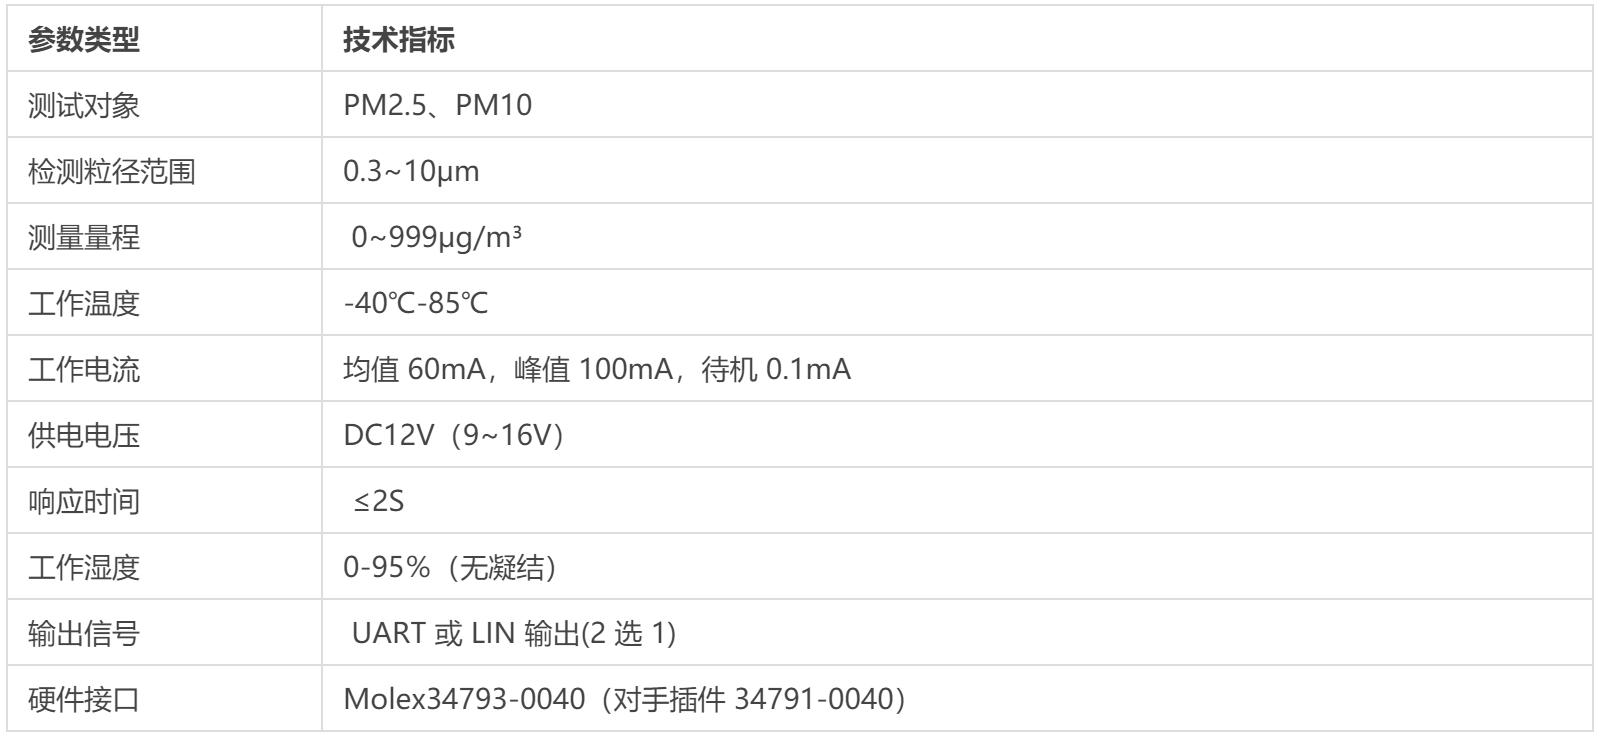 TOMOHO日本友穗车规级PM2.5颗粒物传感器DSQH02-A